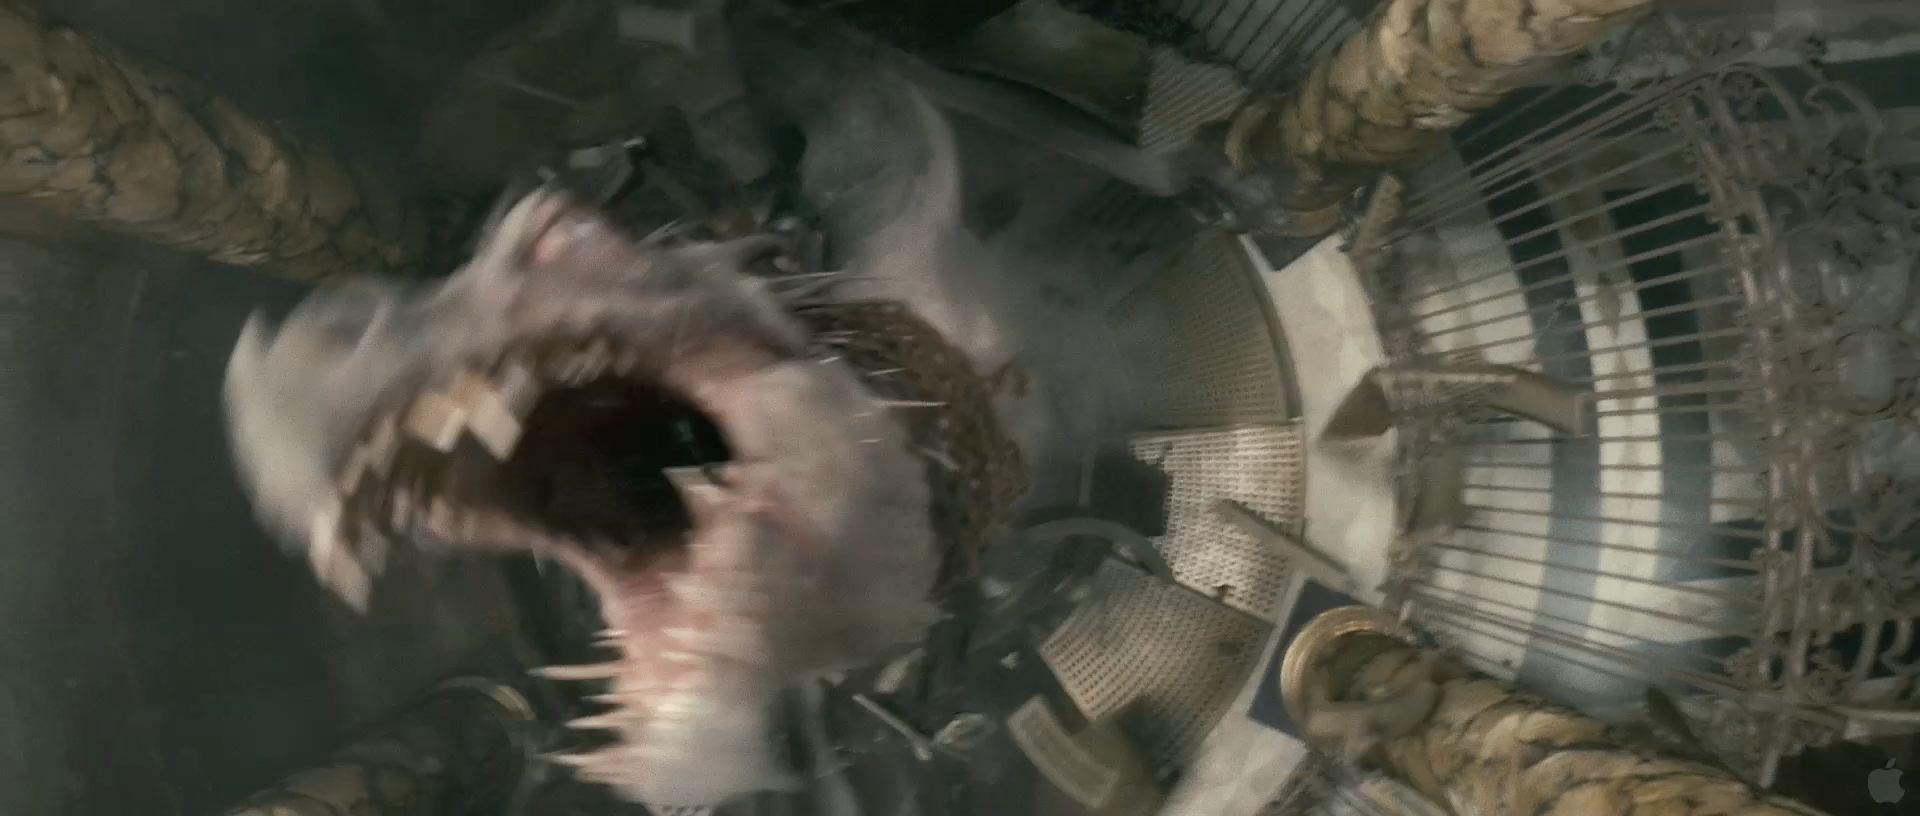 Harry Potter BlogHogwarts HP7 2 Trailer 48